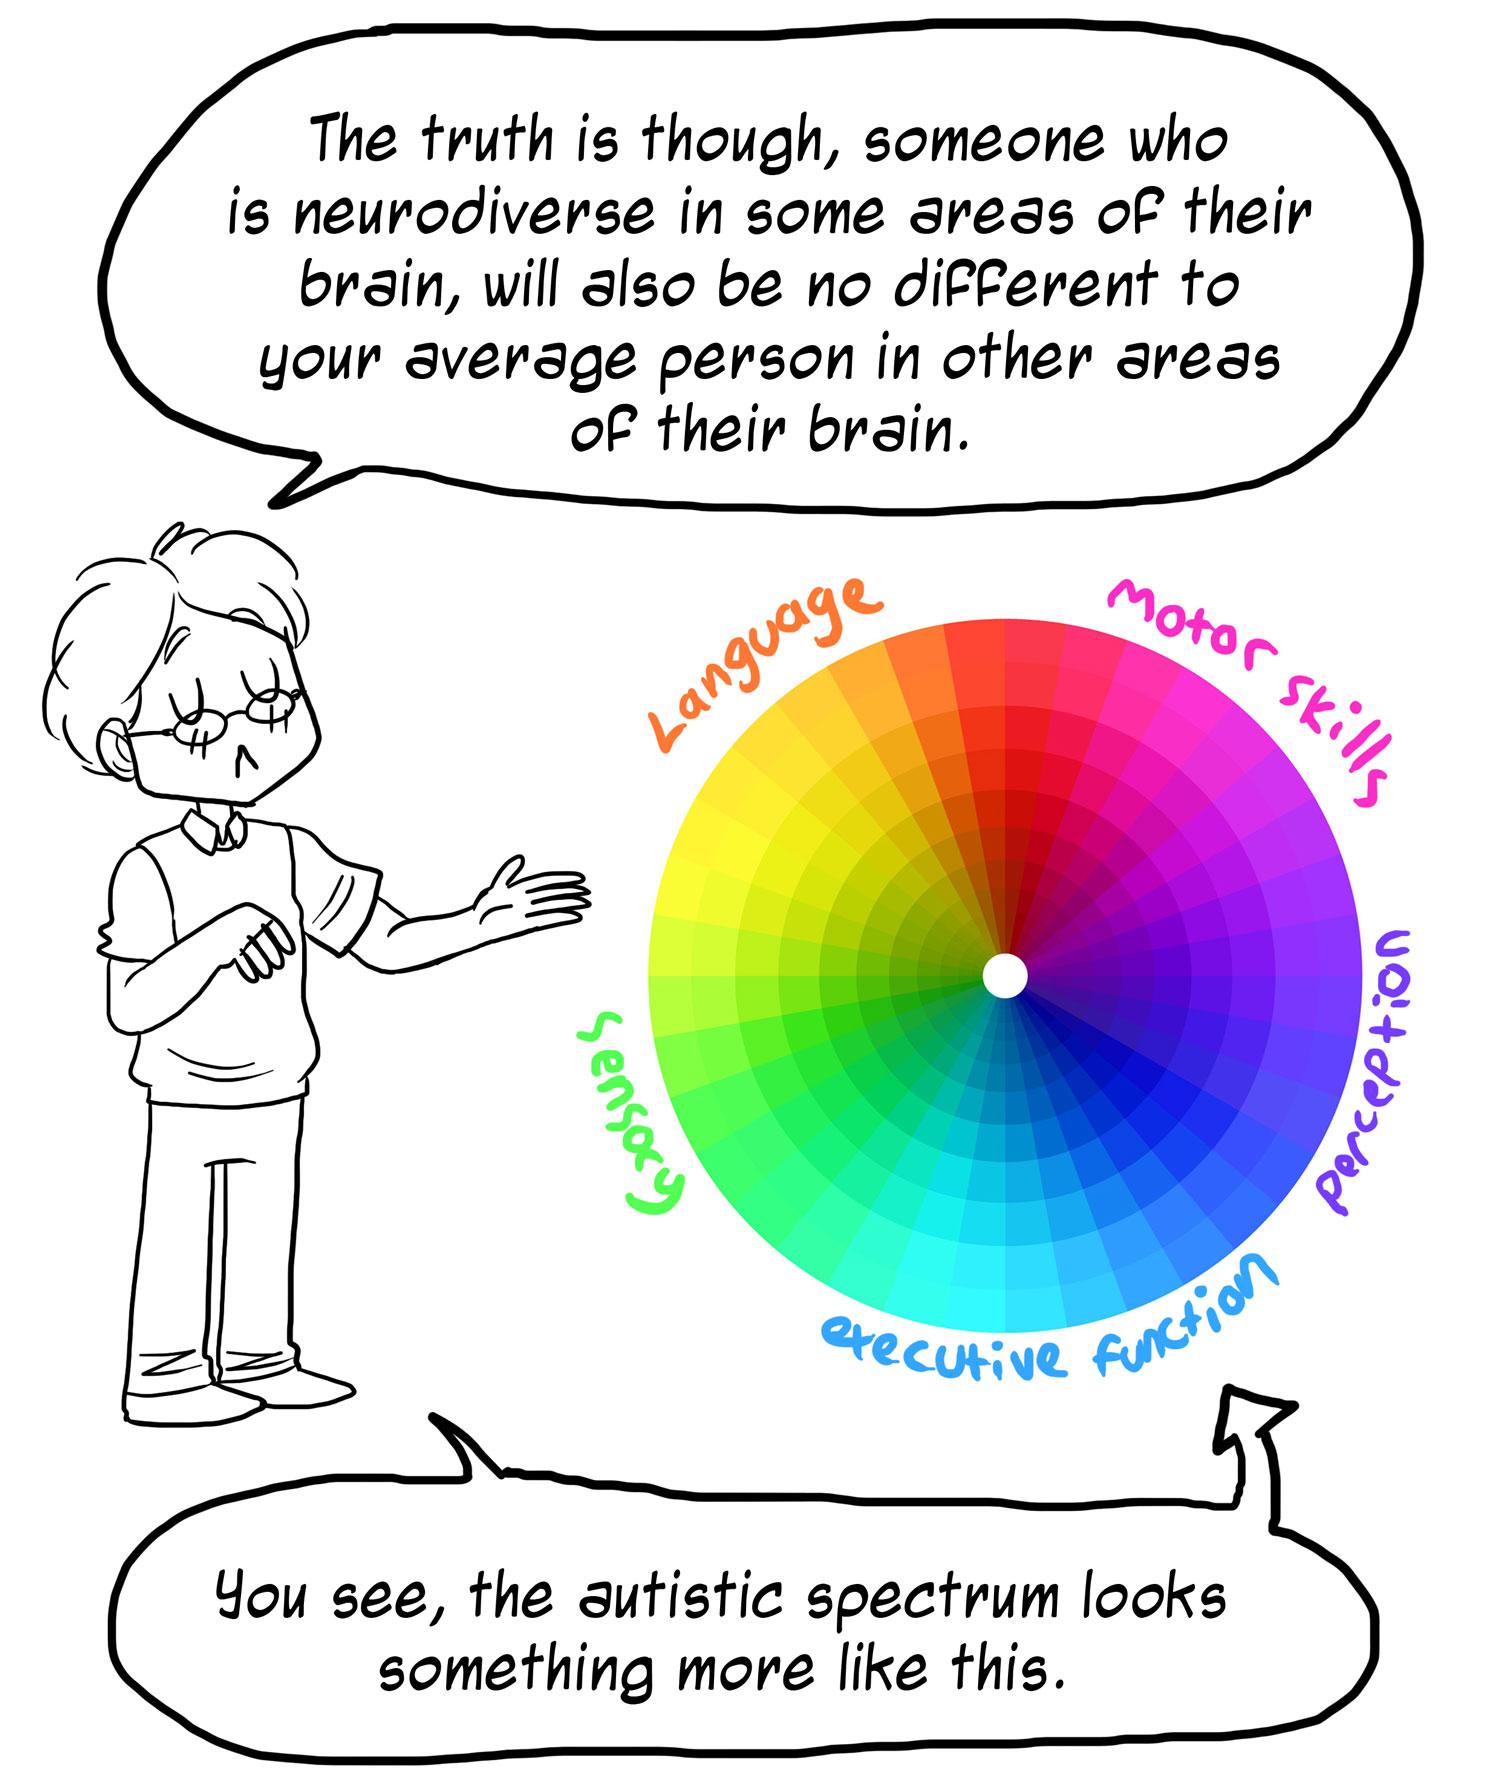 neurodiverse